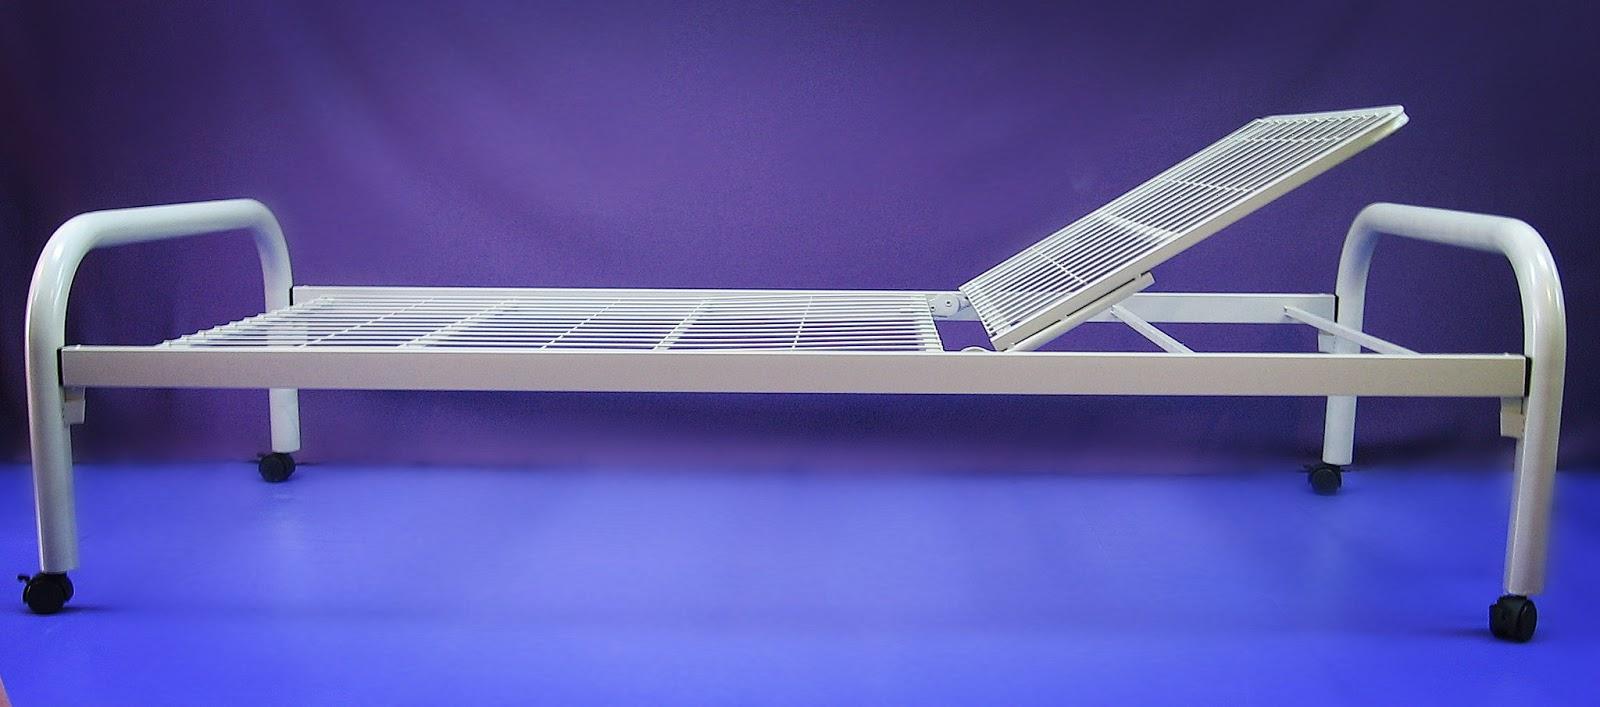 14. Basic hospital bed manual single fowler without crank 手调單搖床 家居護理床